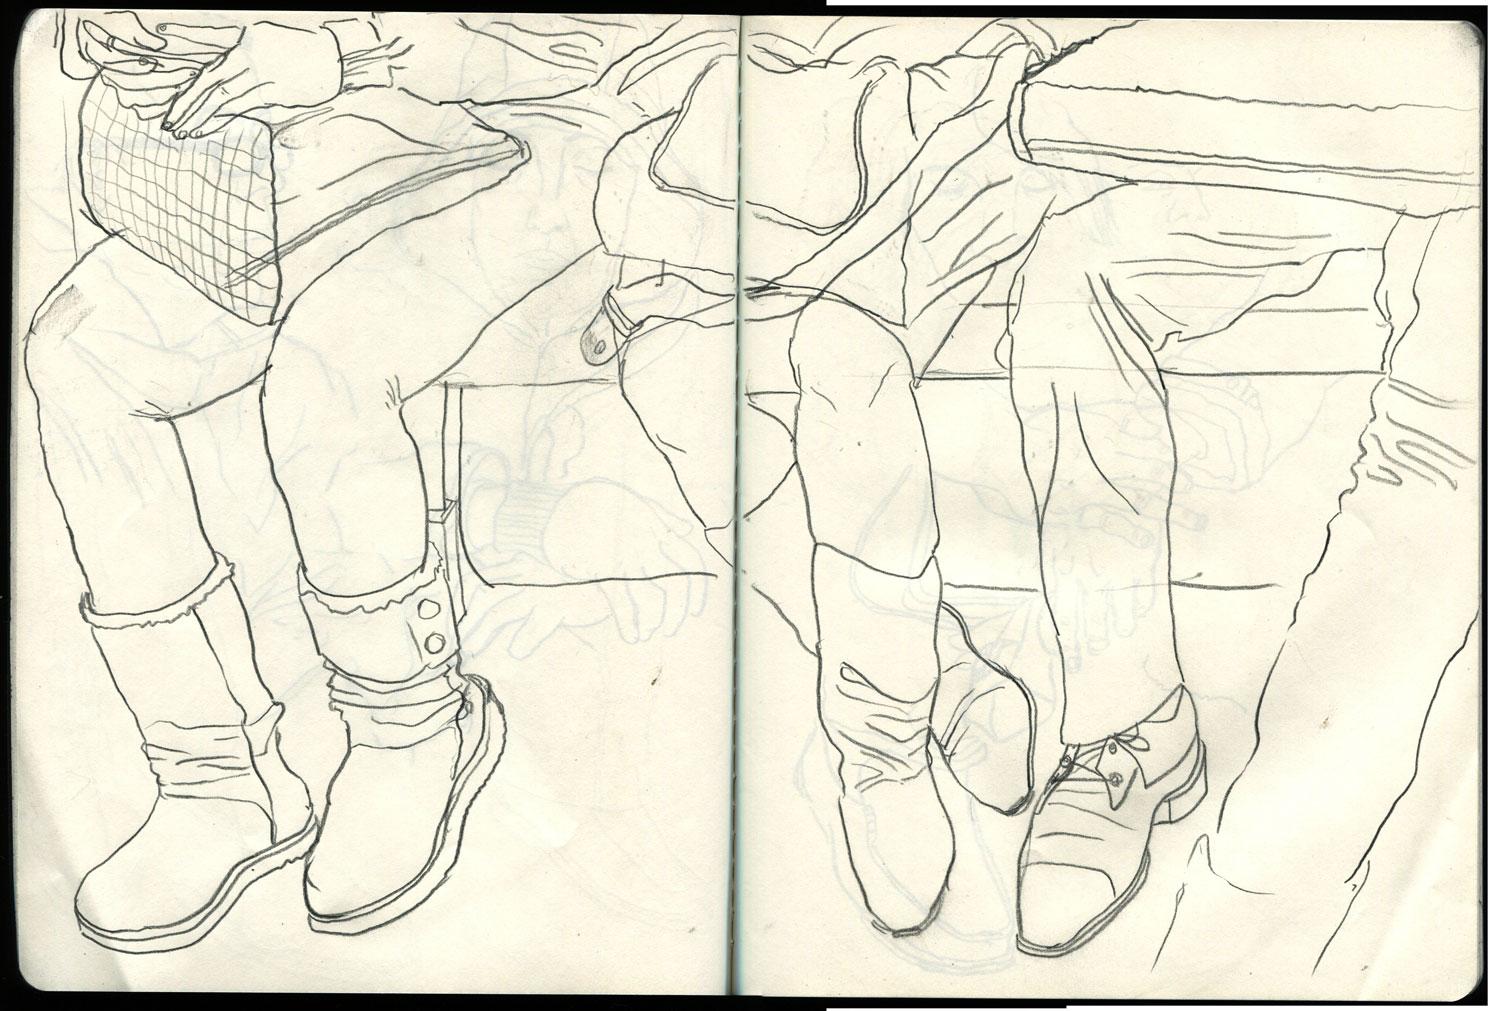 1490x1011 New York City Subway Train Drawings Breaking In A New Sketchbook